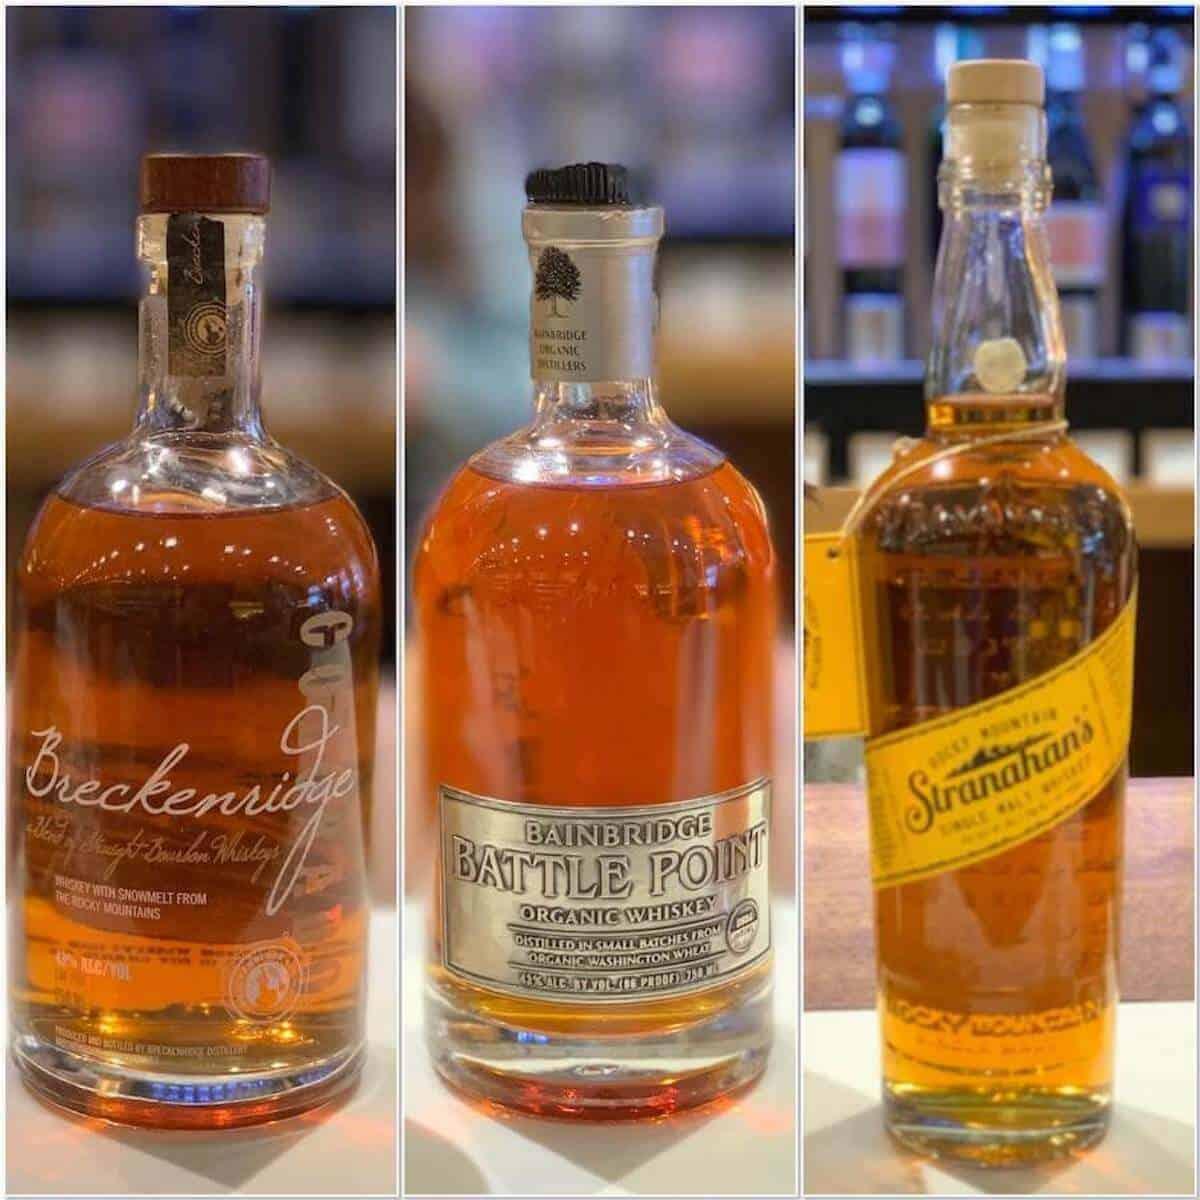 Collage of Bainbridge, Breckinridge, Stranahan's whiskey bottles on a counter.